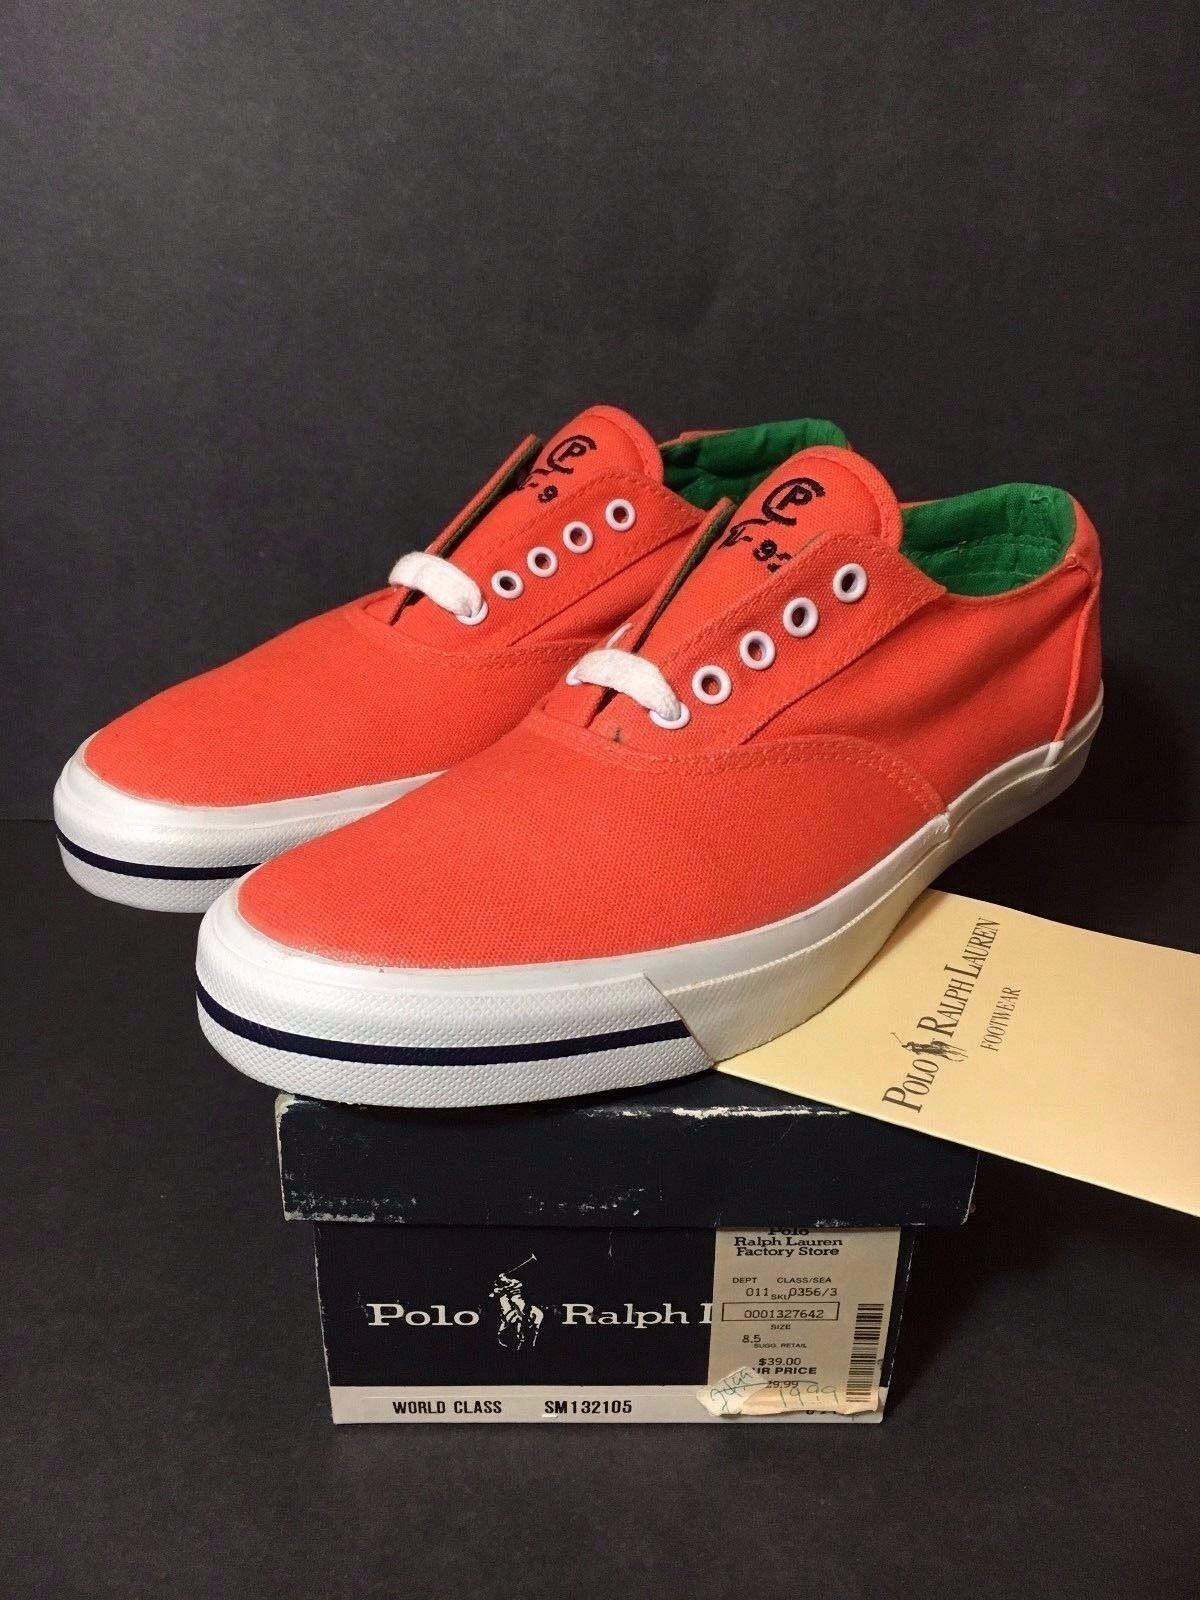 Nuevo POLO RALPH LAUREN CP RL 92 Naranja zapatillas Talla 8.5 Vintage nuevo viejo stock STADIUM 93 8